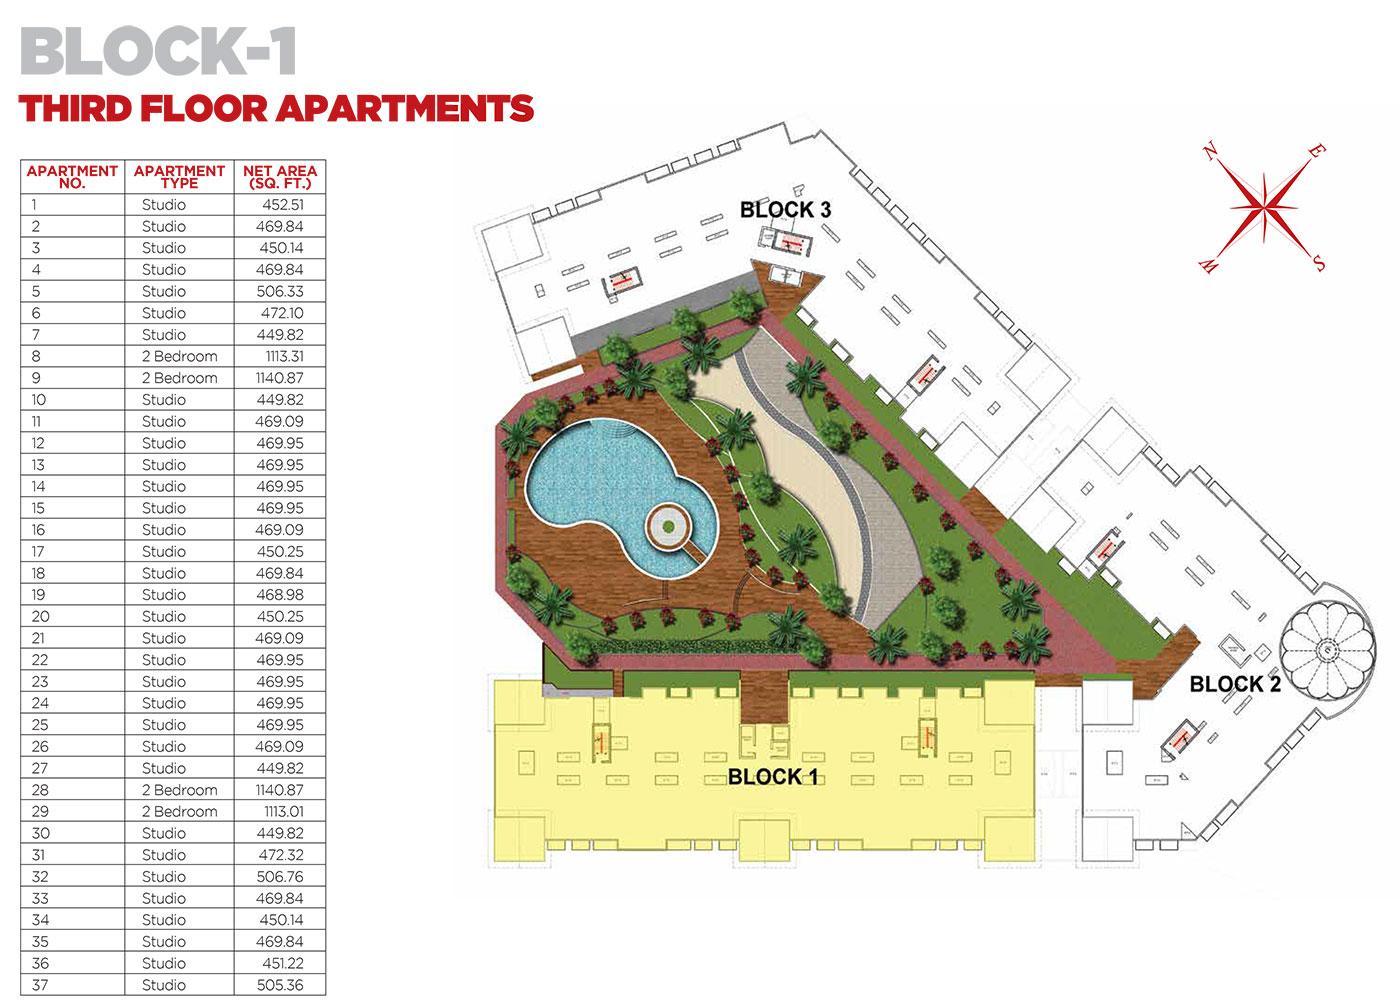 Third Floor Apartments Block 1